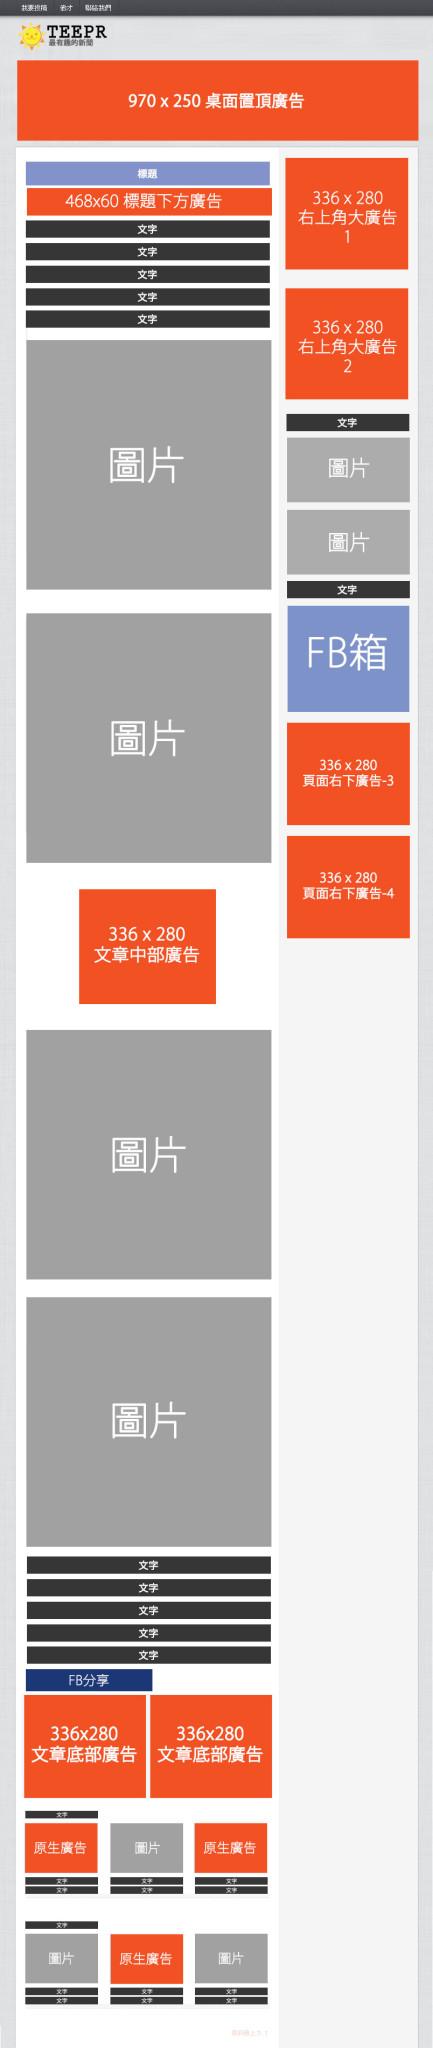 advertisement-desktop-page